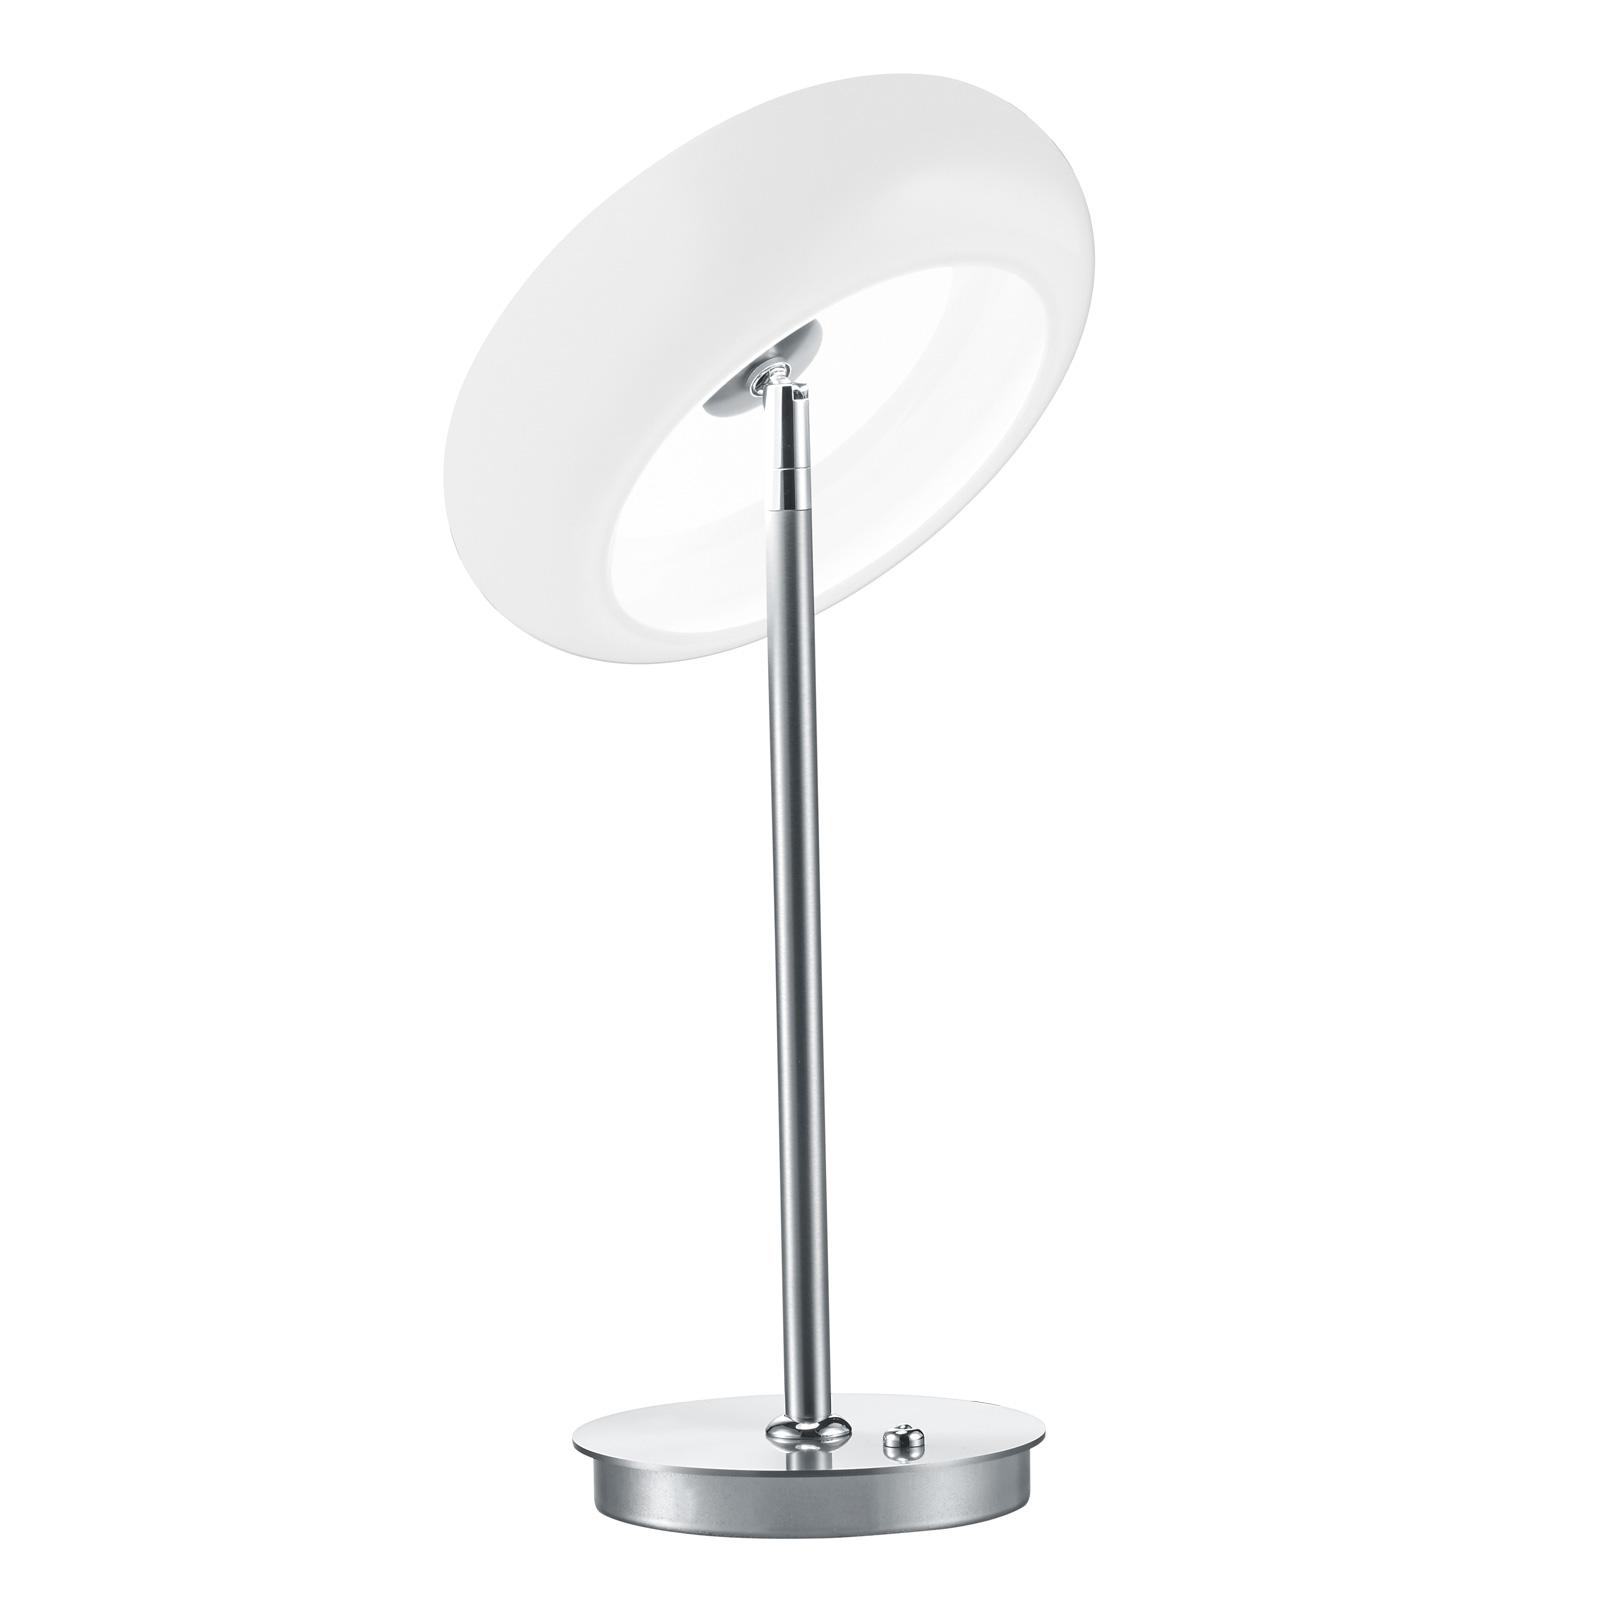 BANKAMP Centa lampe à poser LED, nickel